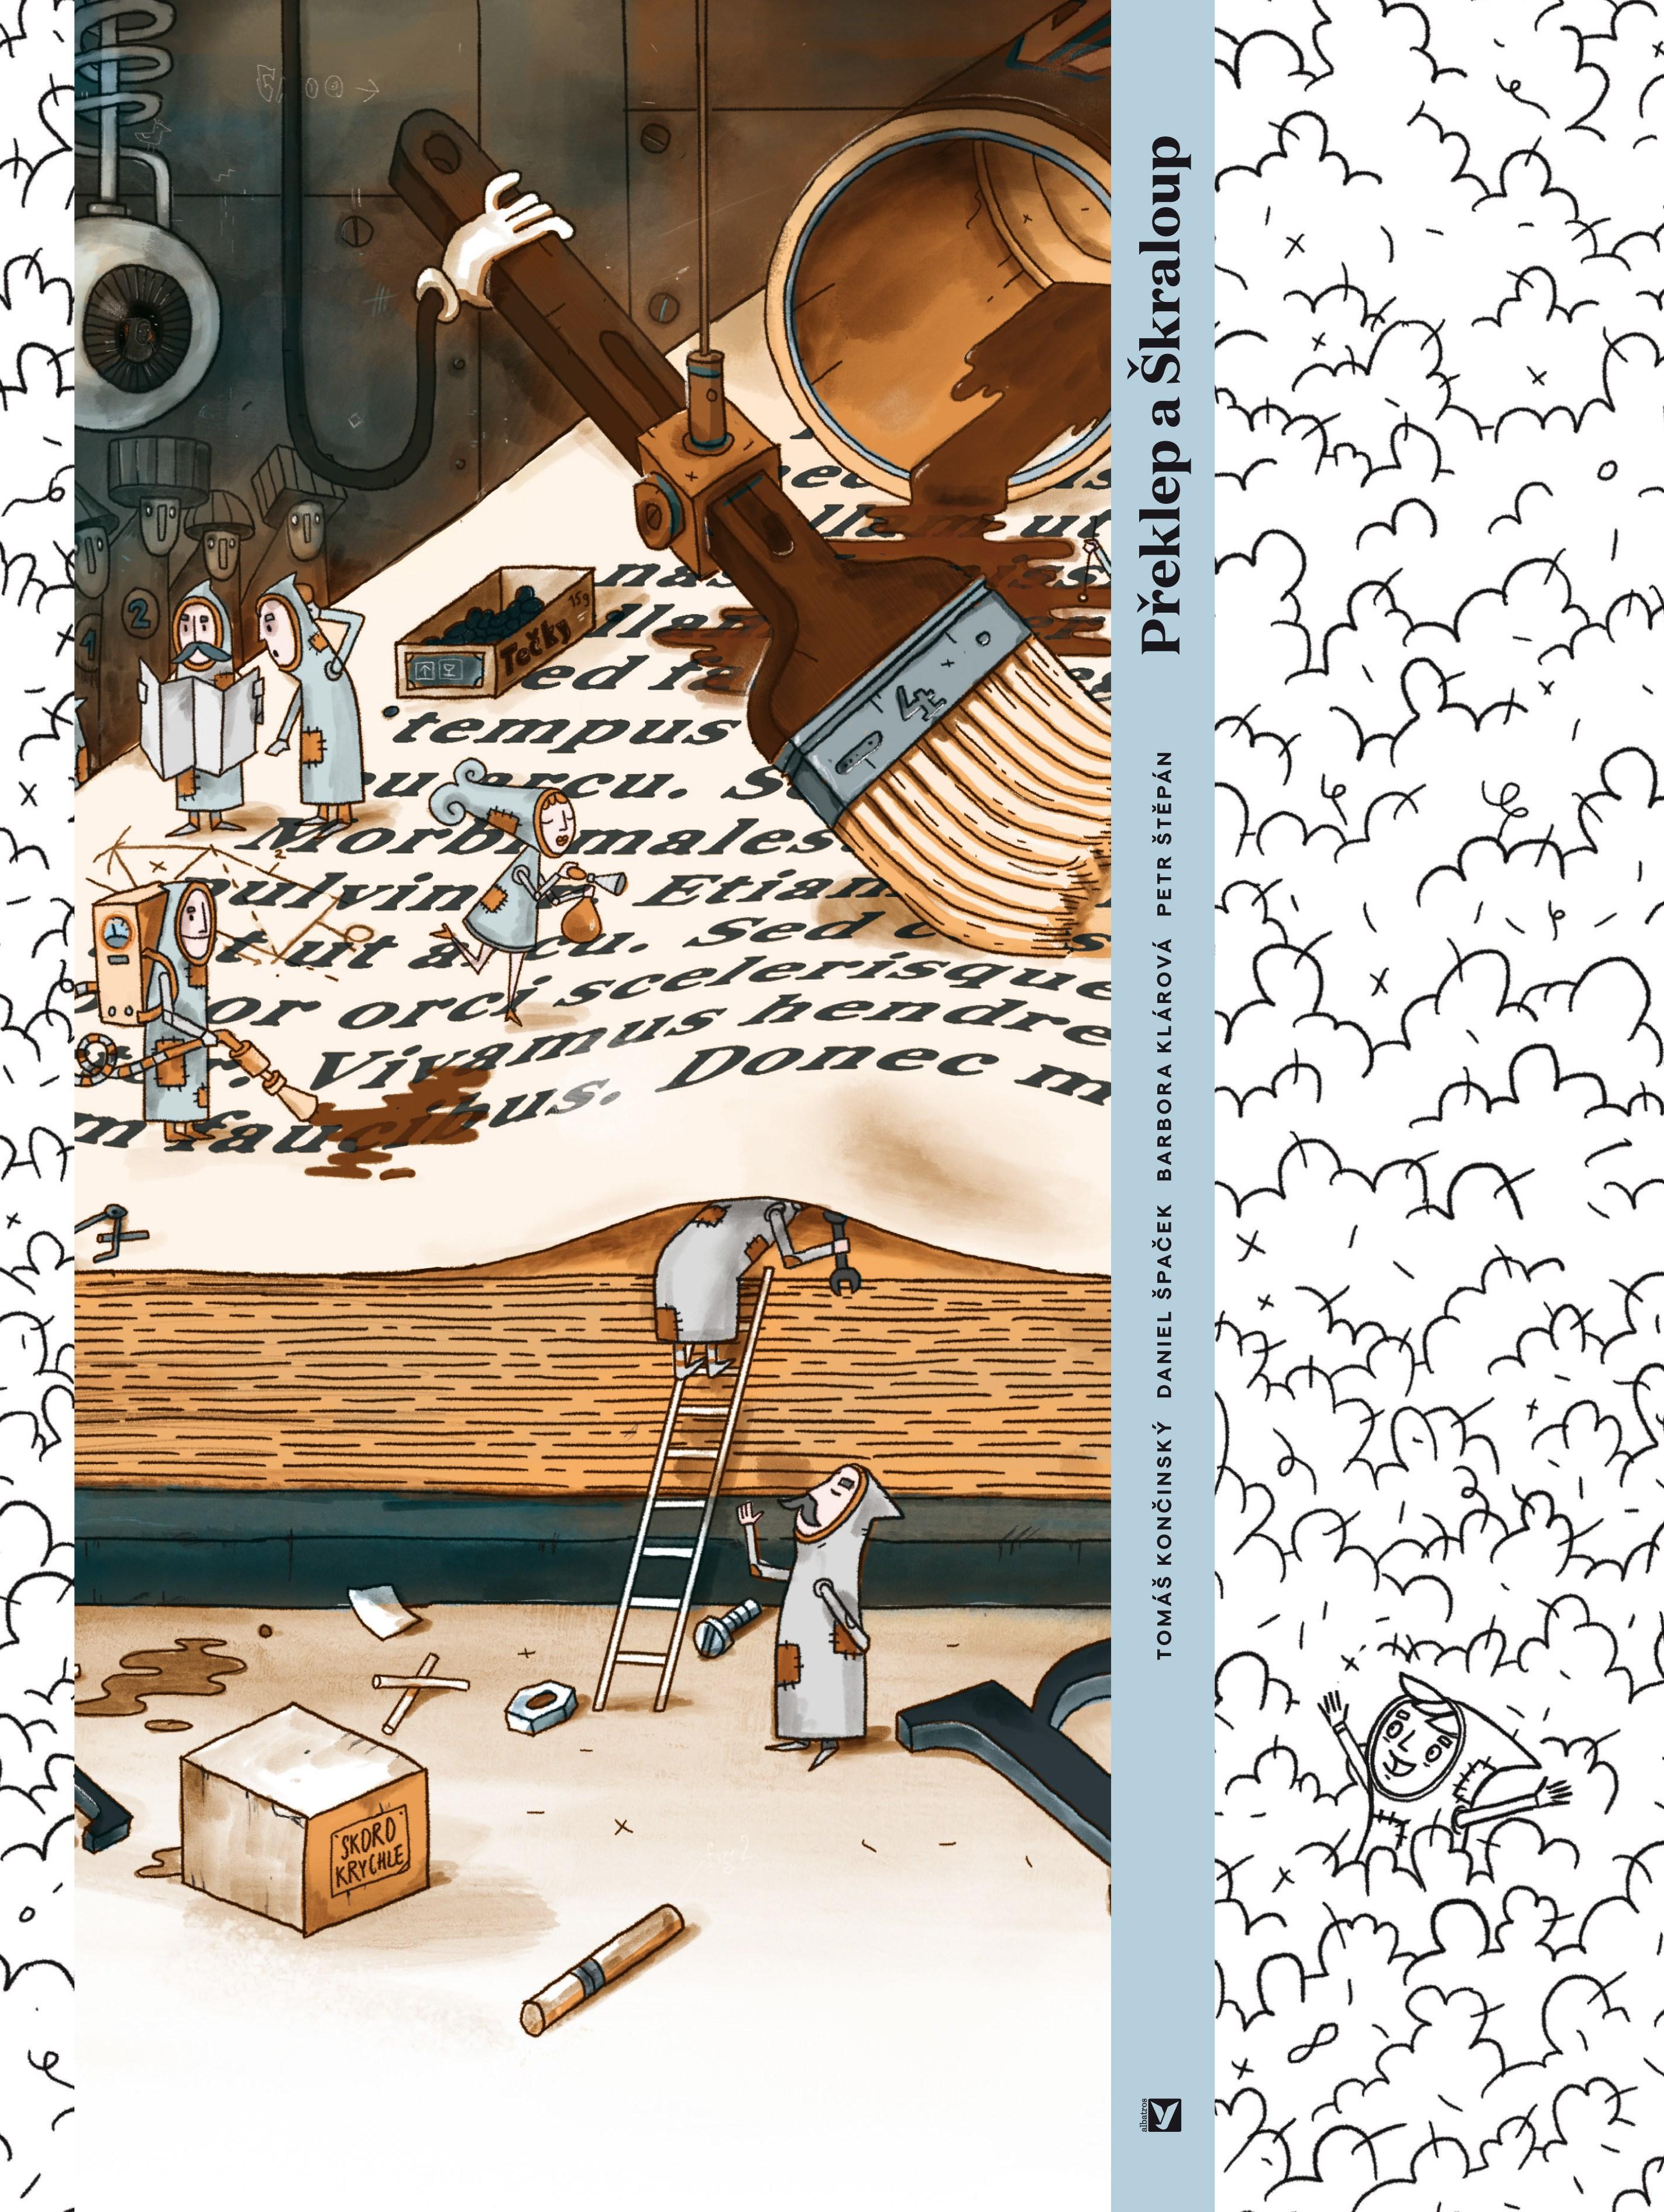 Překlep a Škraloup (Typo und Klecks) Book Cover